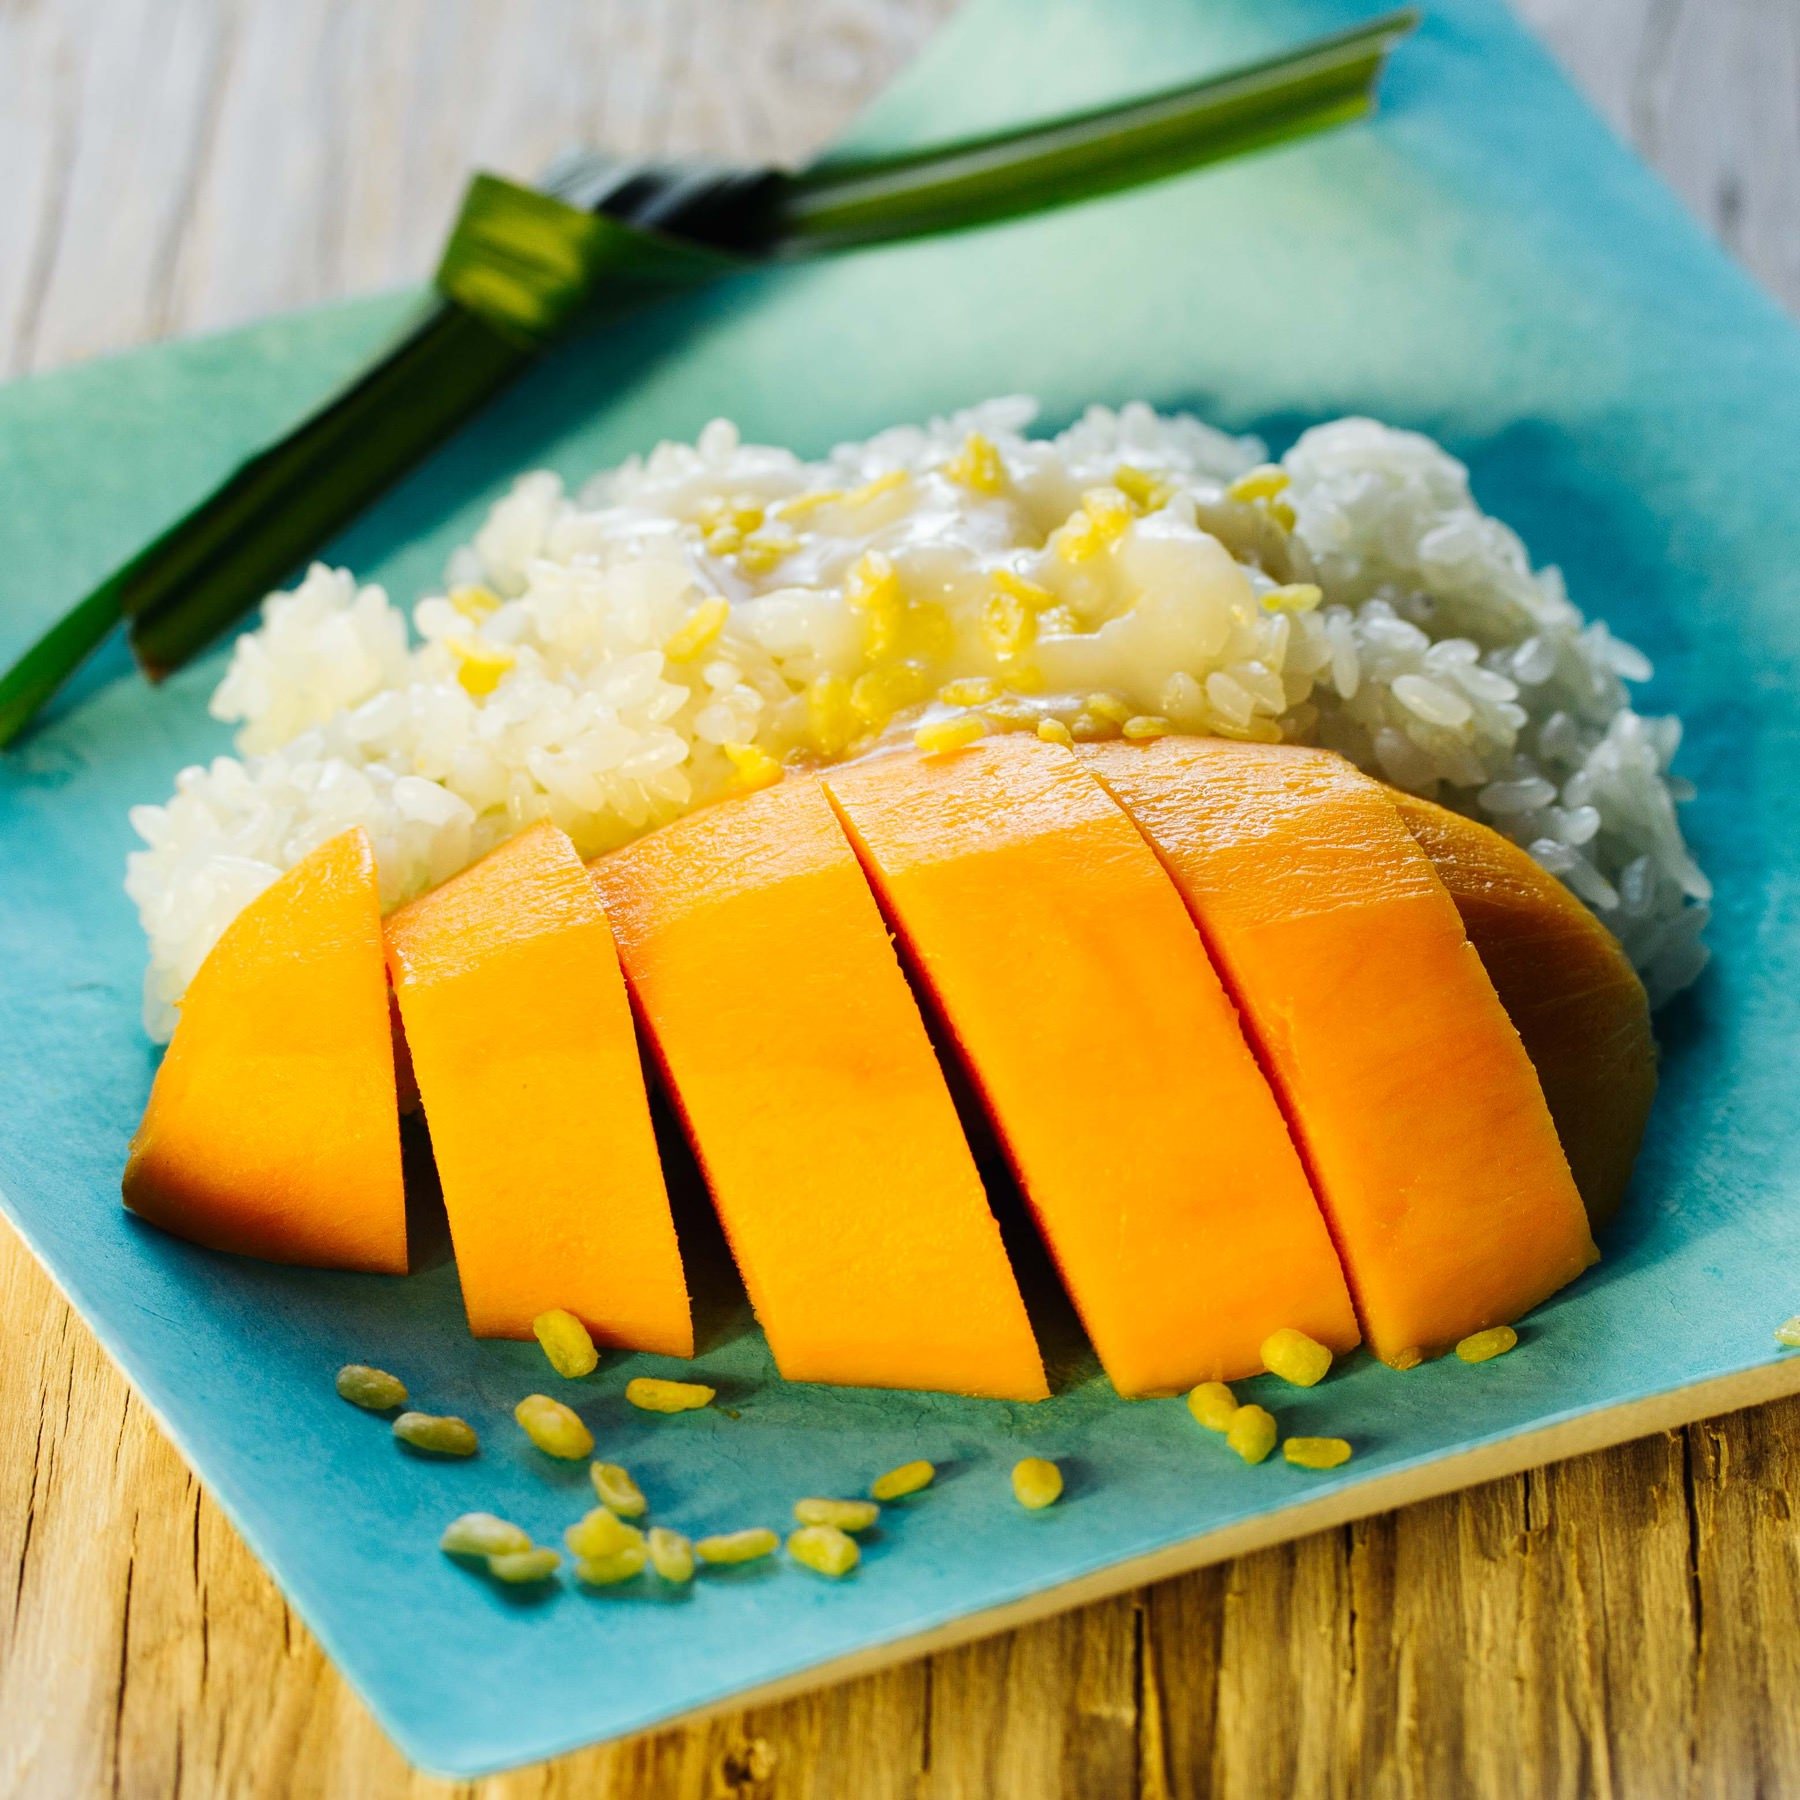 Mango Sticky Rice aus Thailand . Khao Niaow Ma Muang